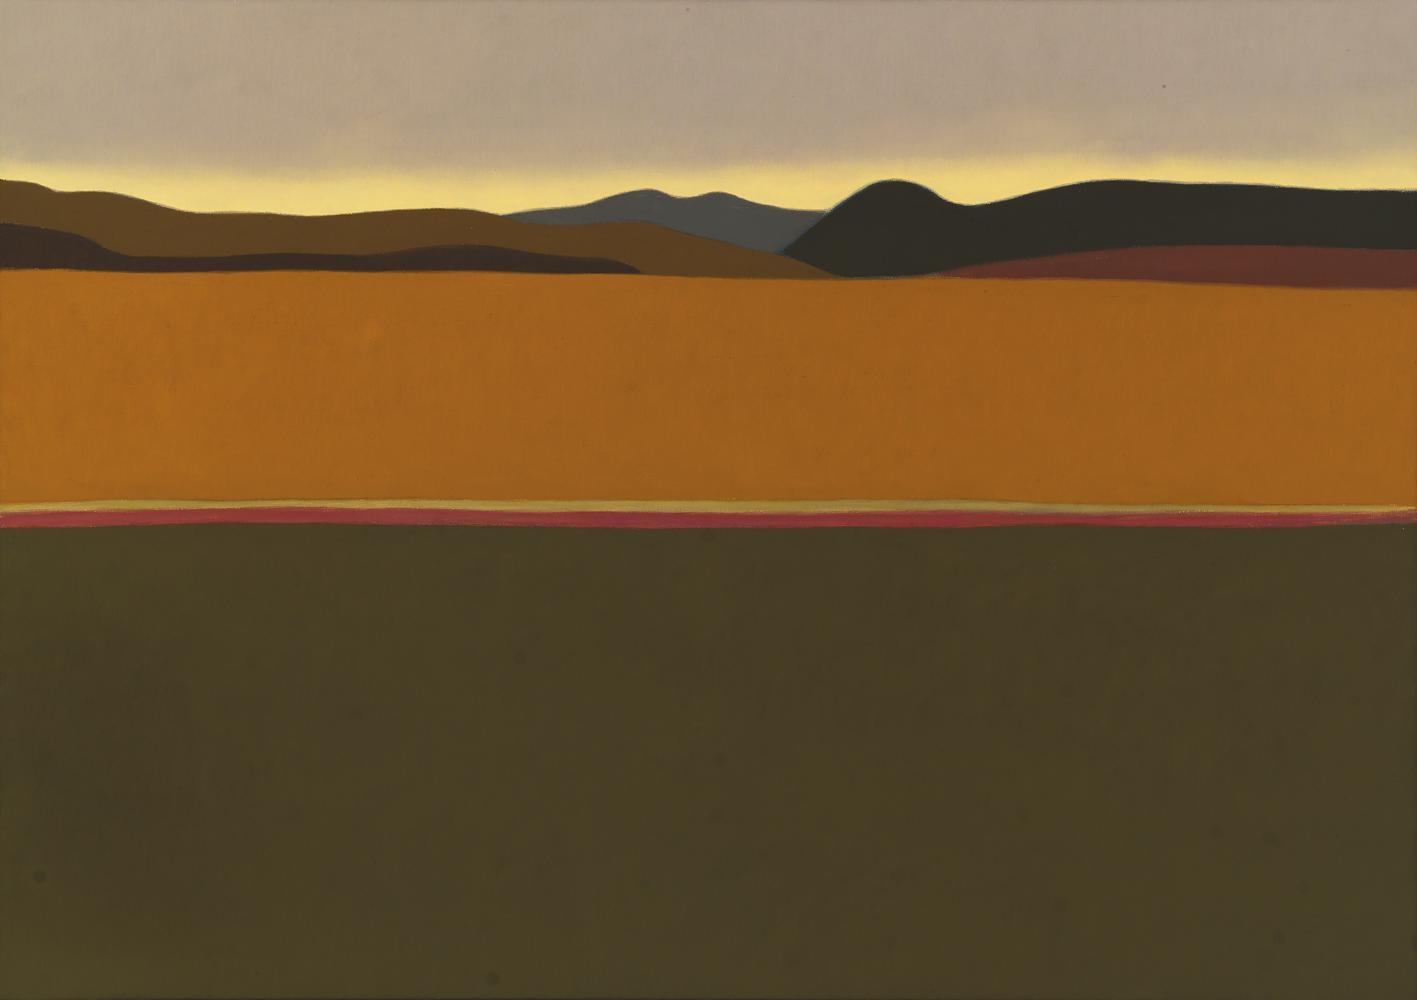 Montes de Zizur, 46 x 65 cm, óleo lienzo, 2003.